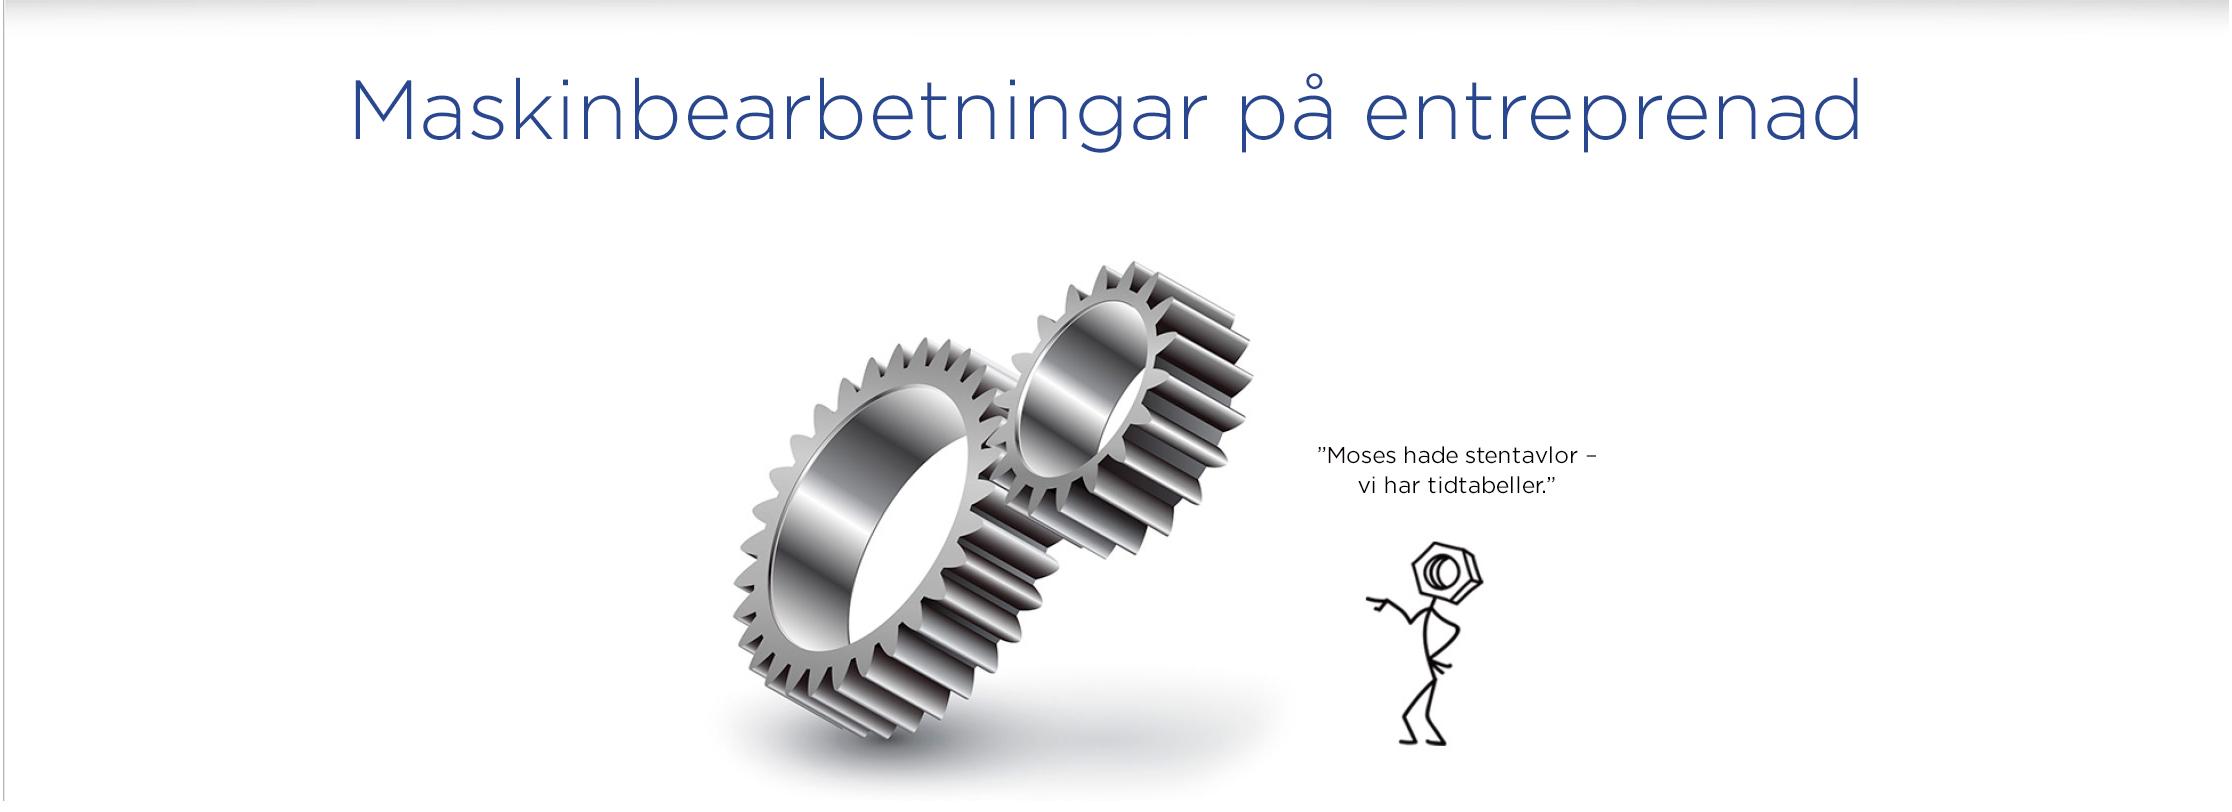 Maskinbearbetningar på entreprenad